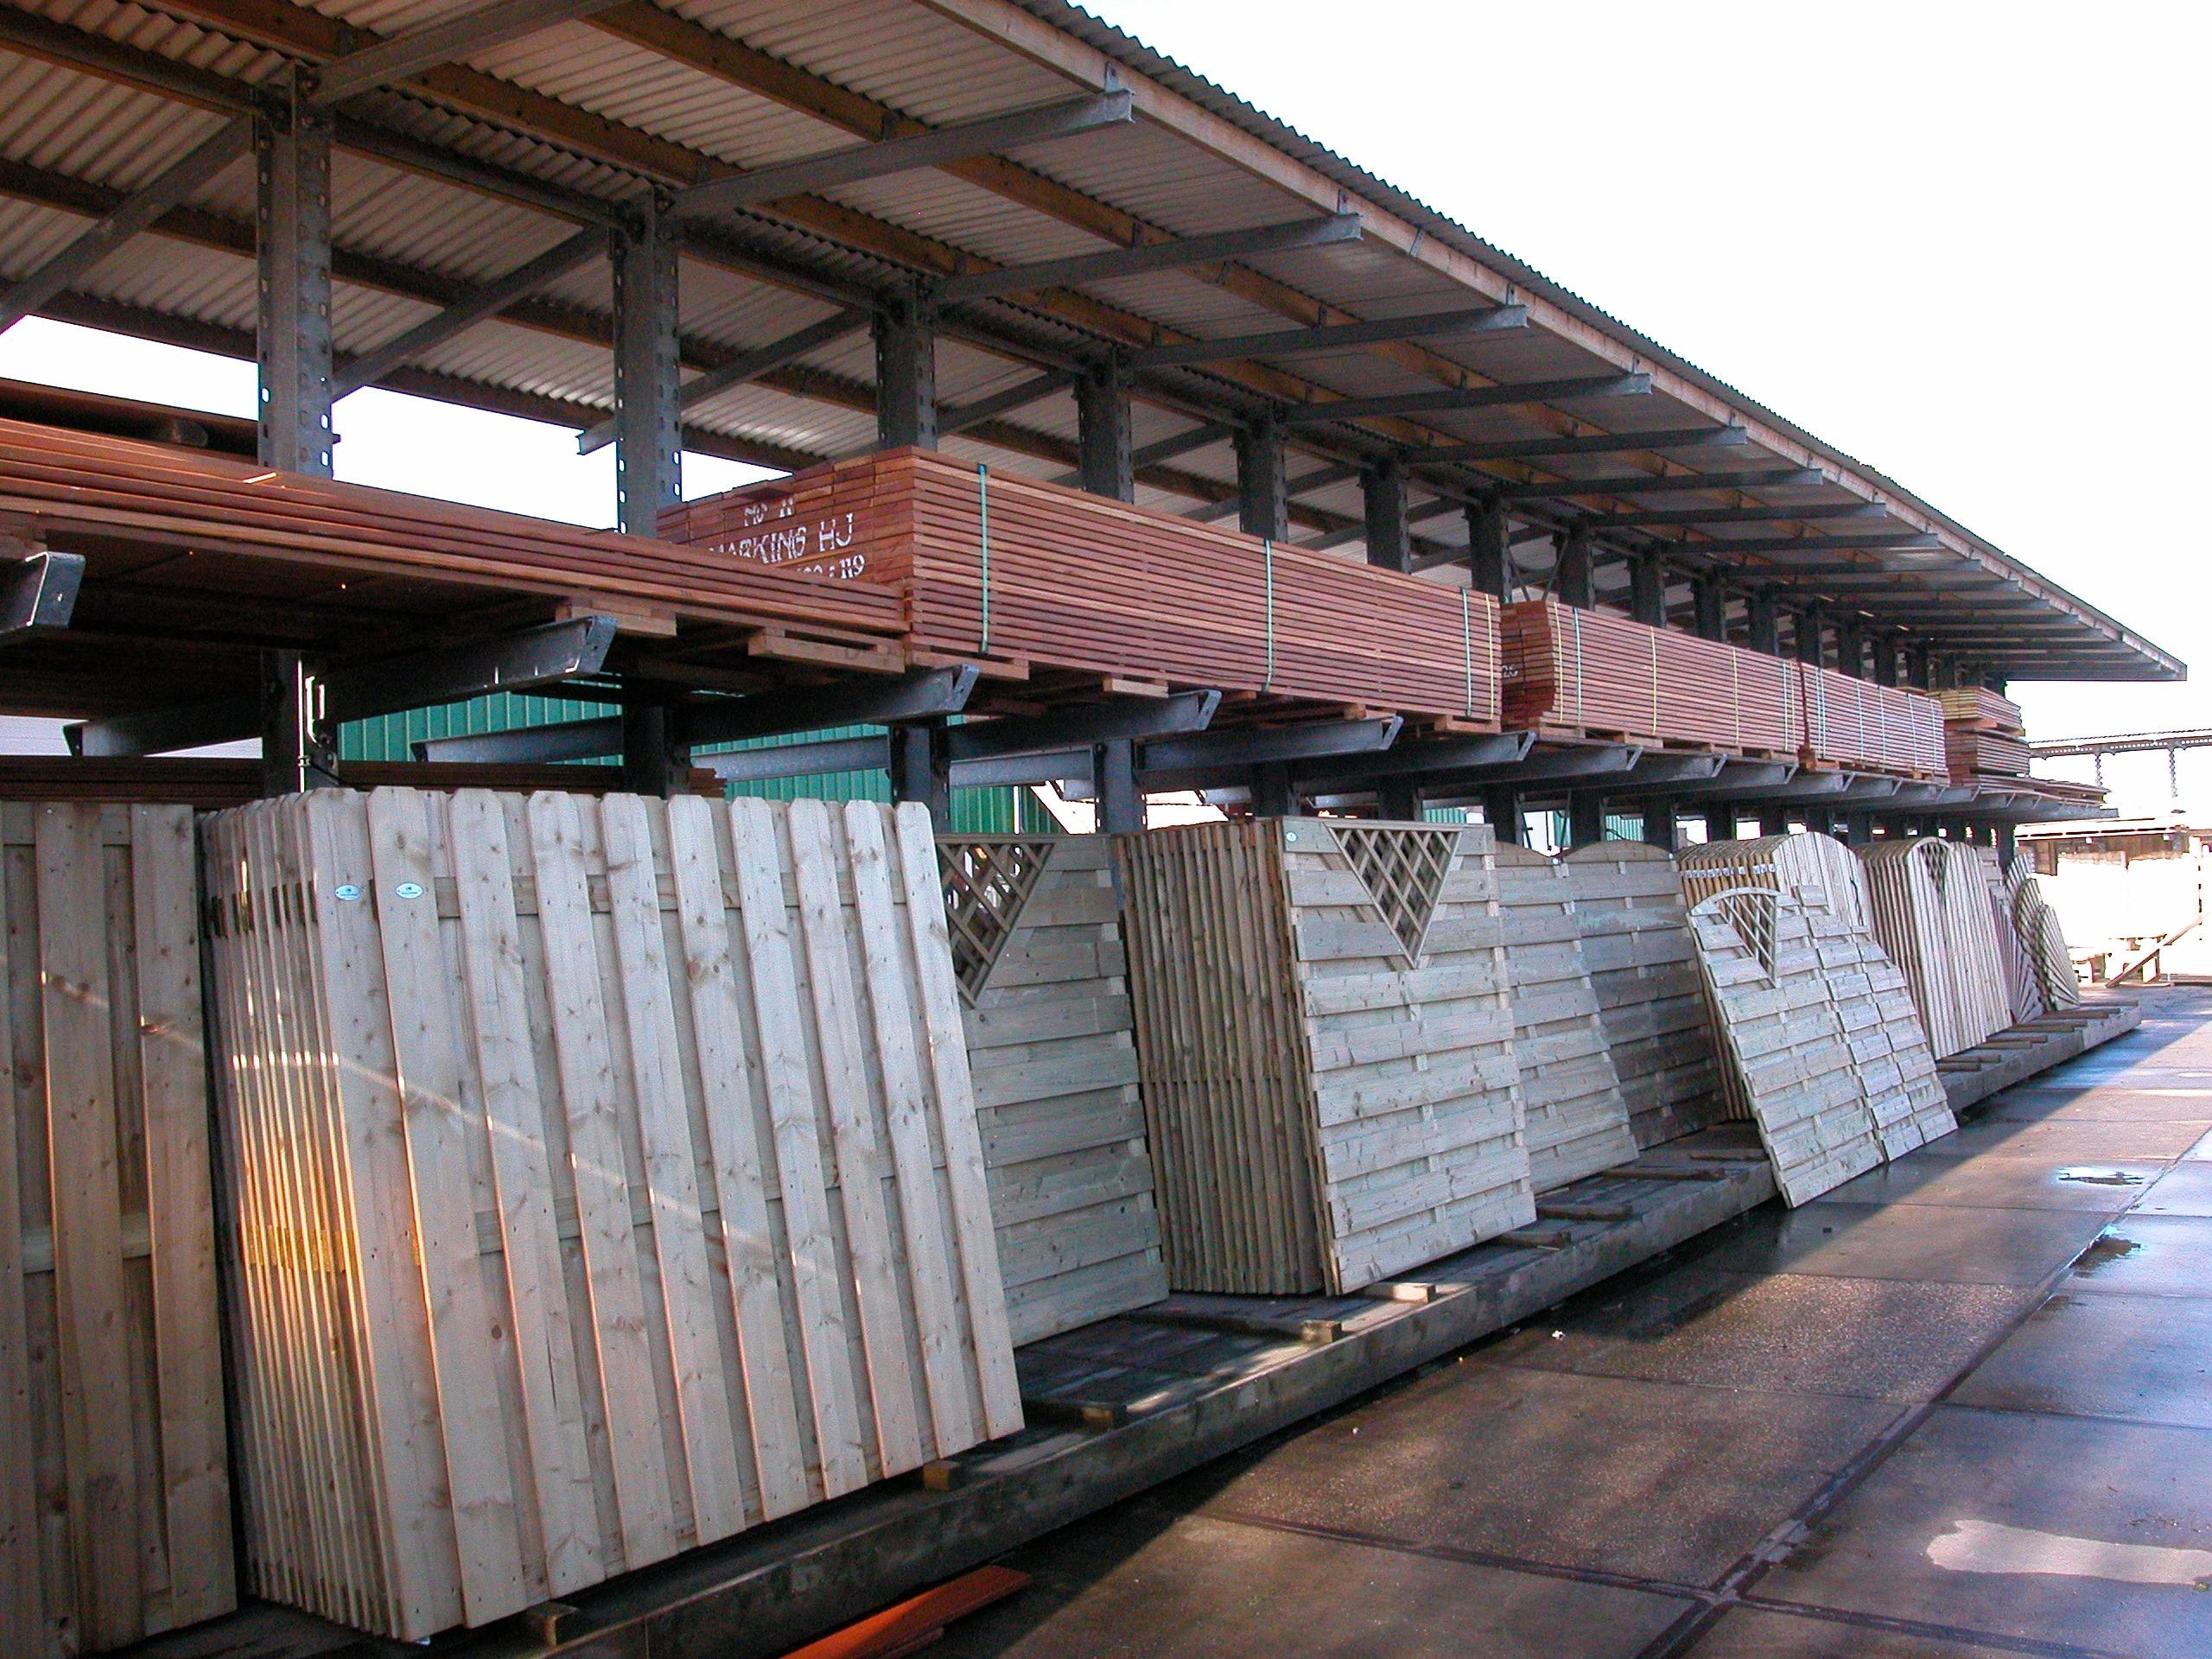 Opslag bouwmatr. 6 Draagarmstelling met dak voor opslag van hout